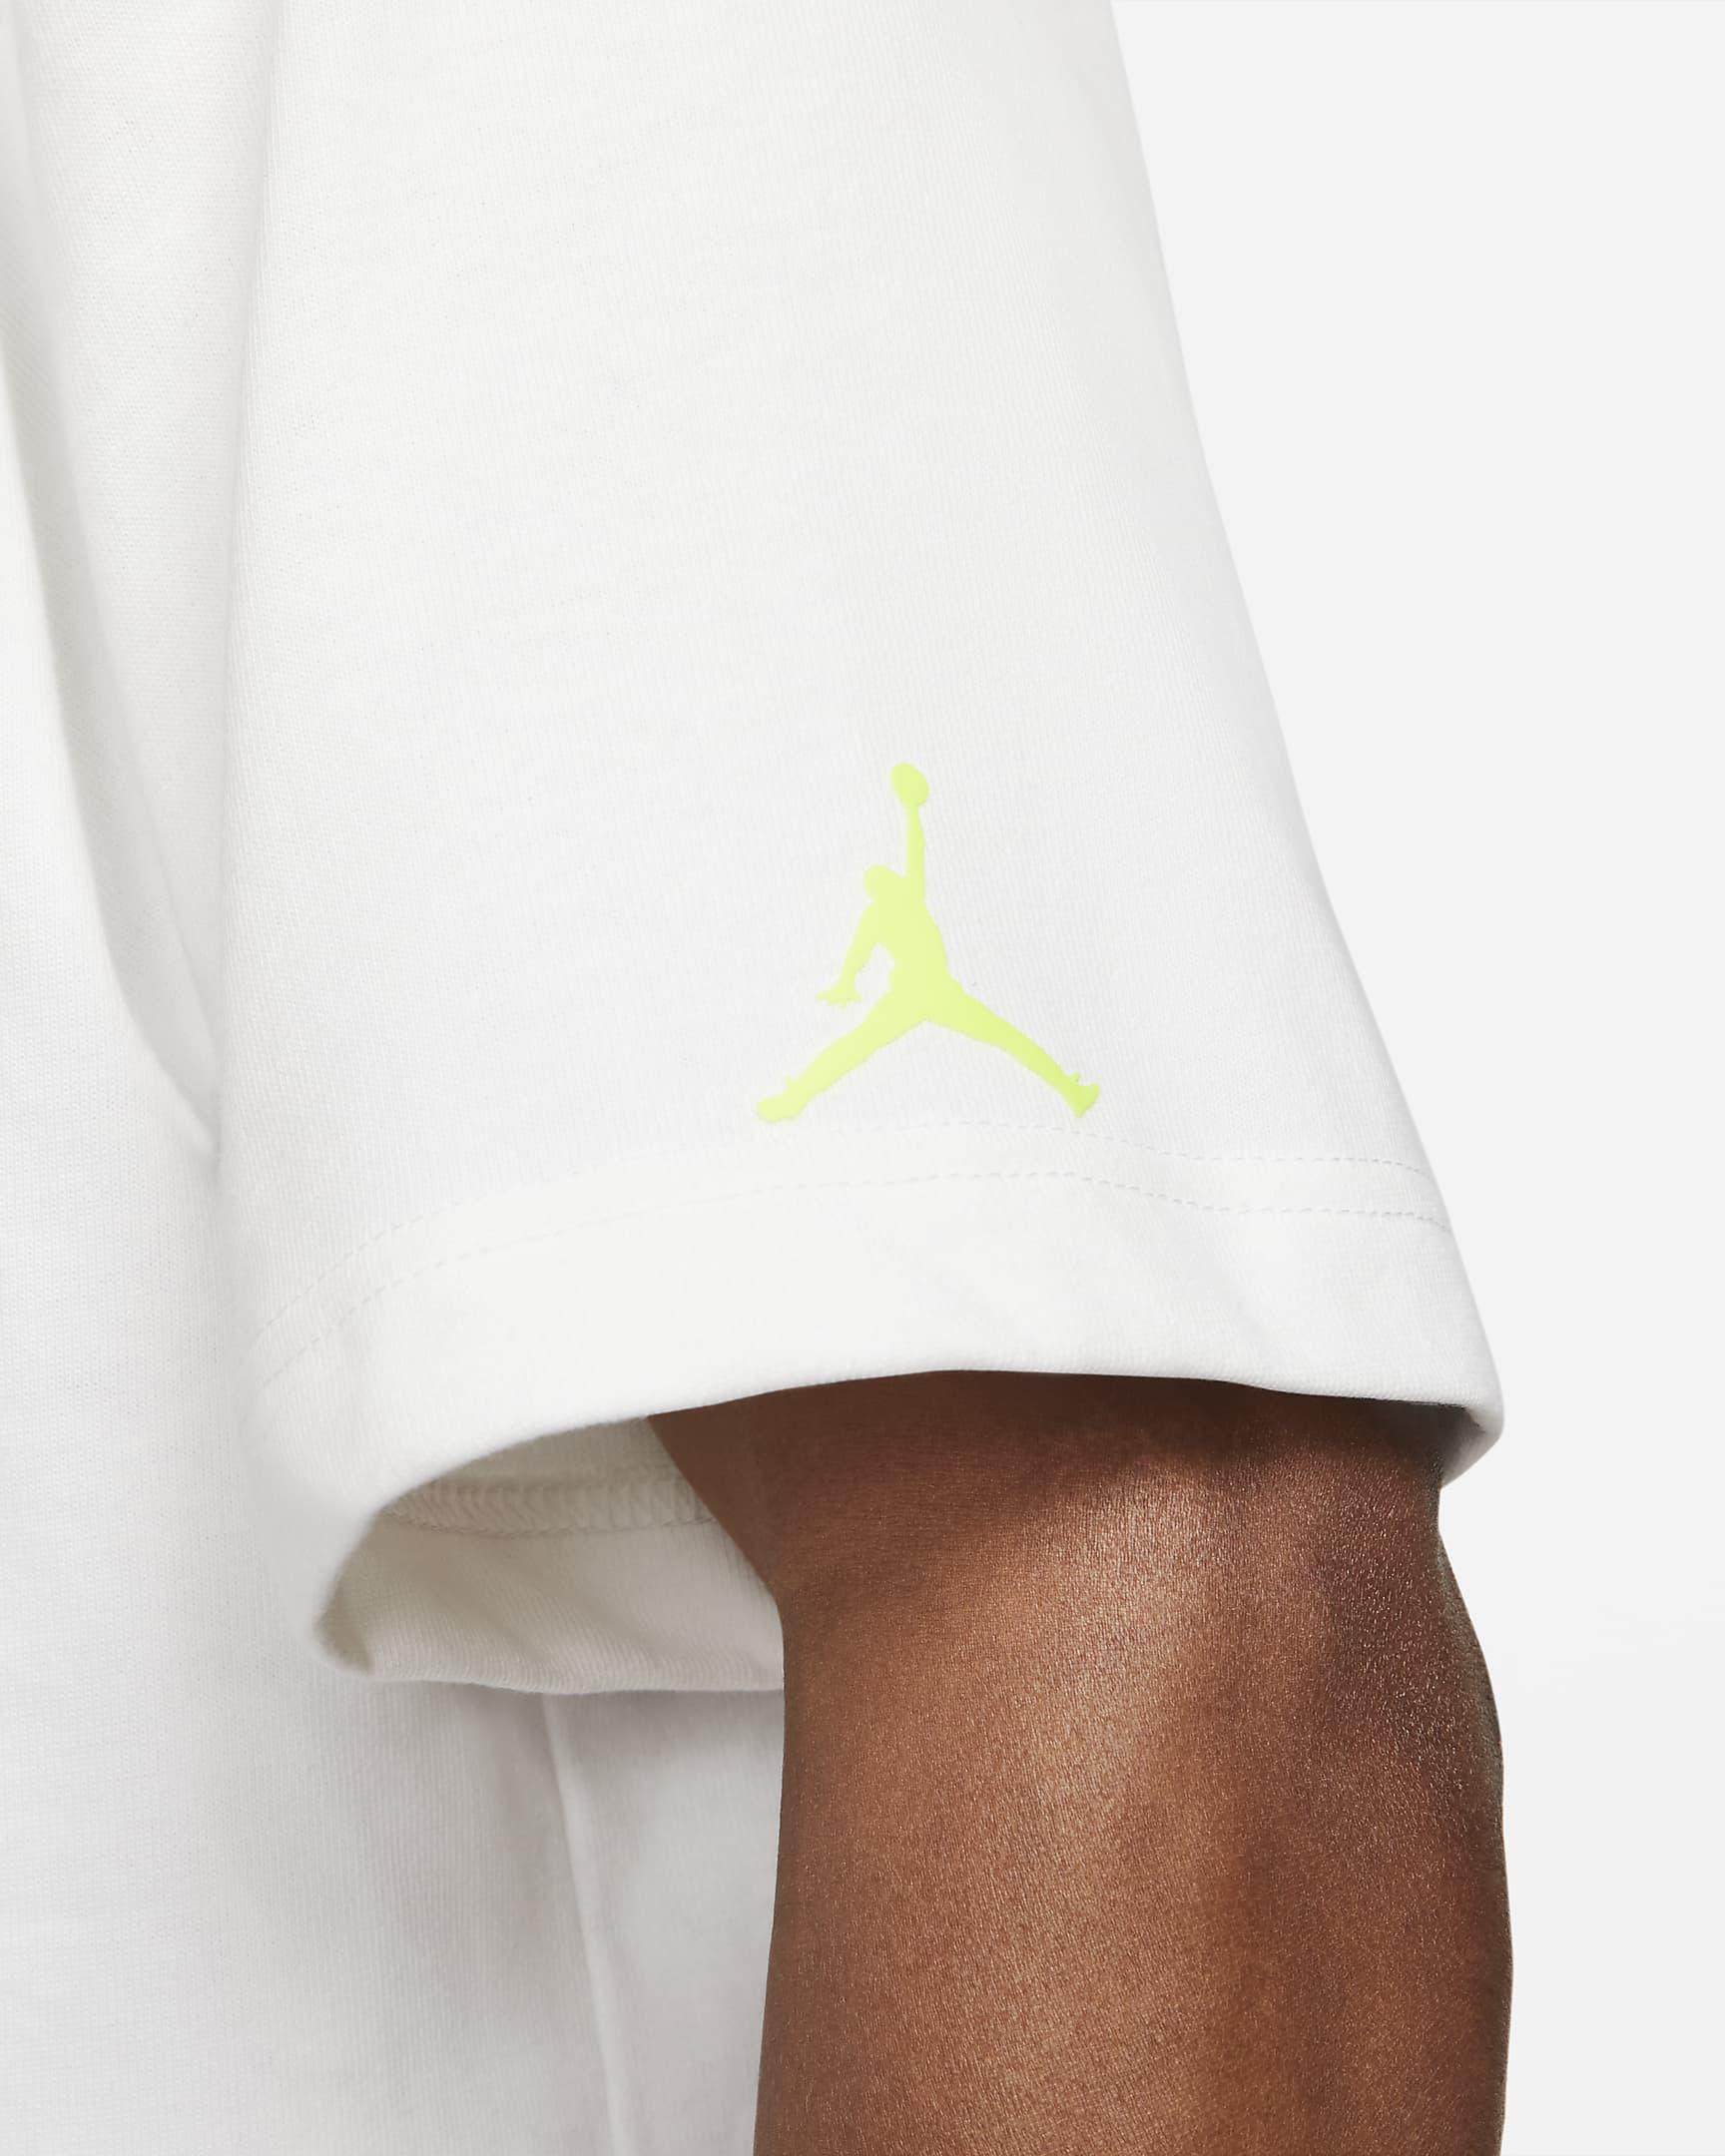 jordan-why-not-mens-short-sleeve-t-shirt-sw10WD-1